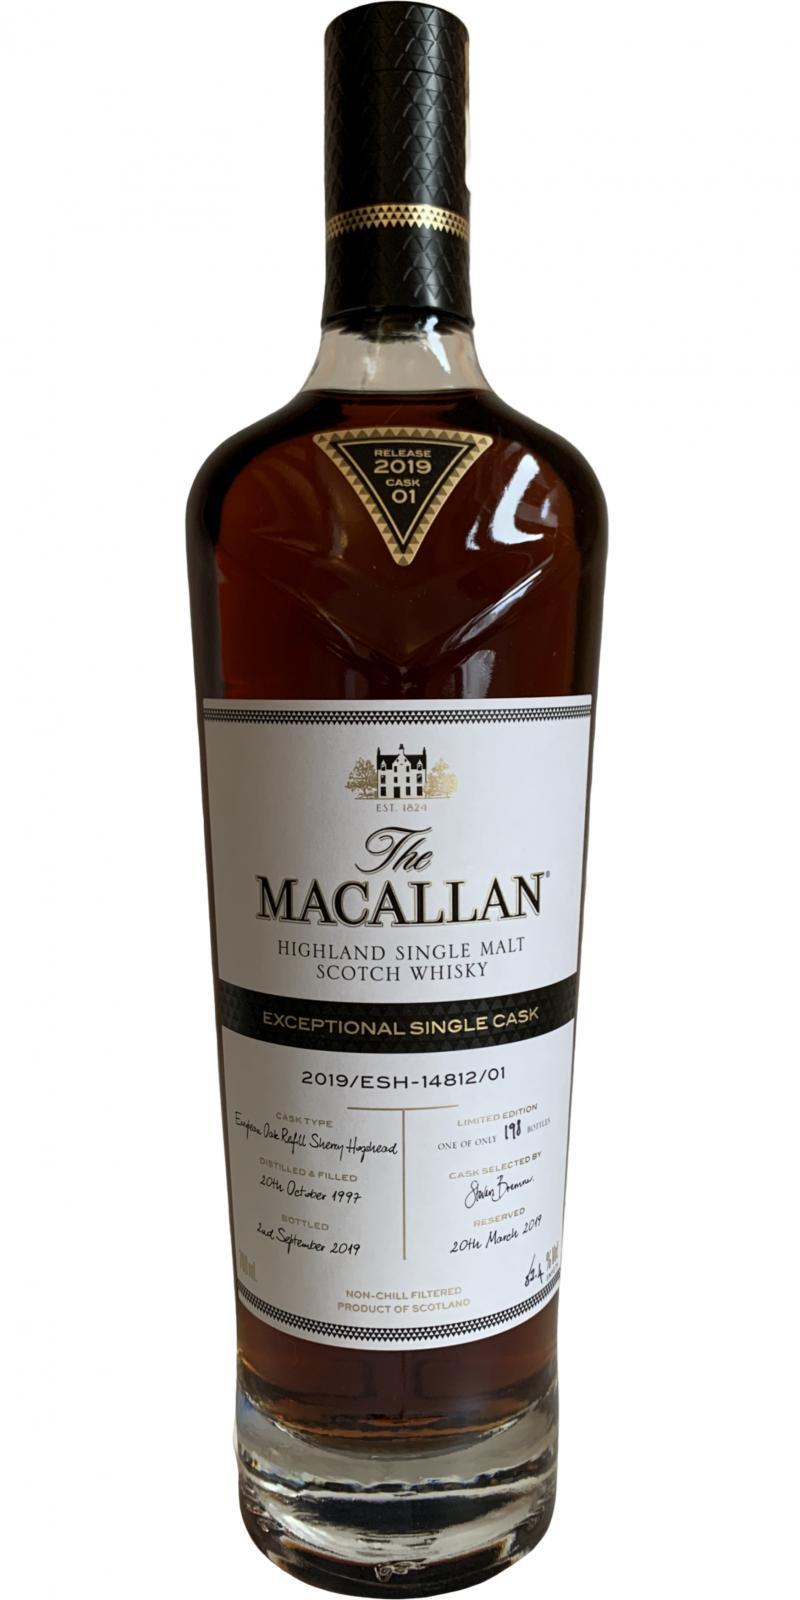 Macallan 2019/ESH–14812/01